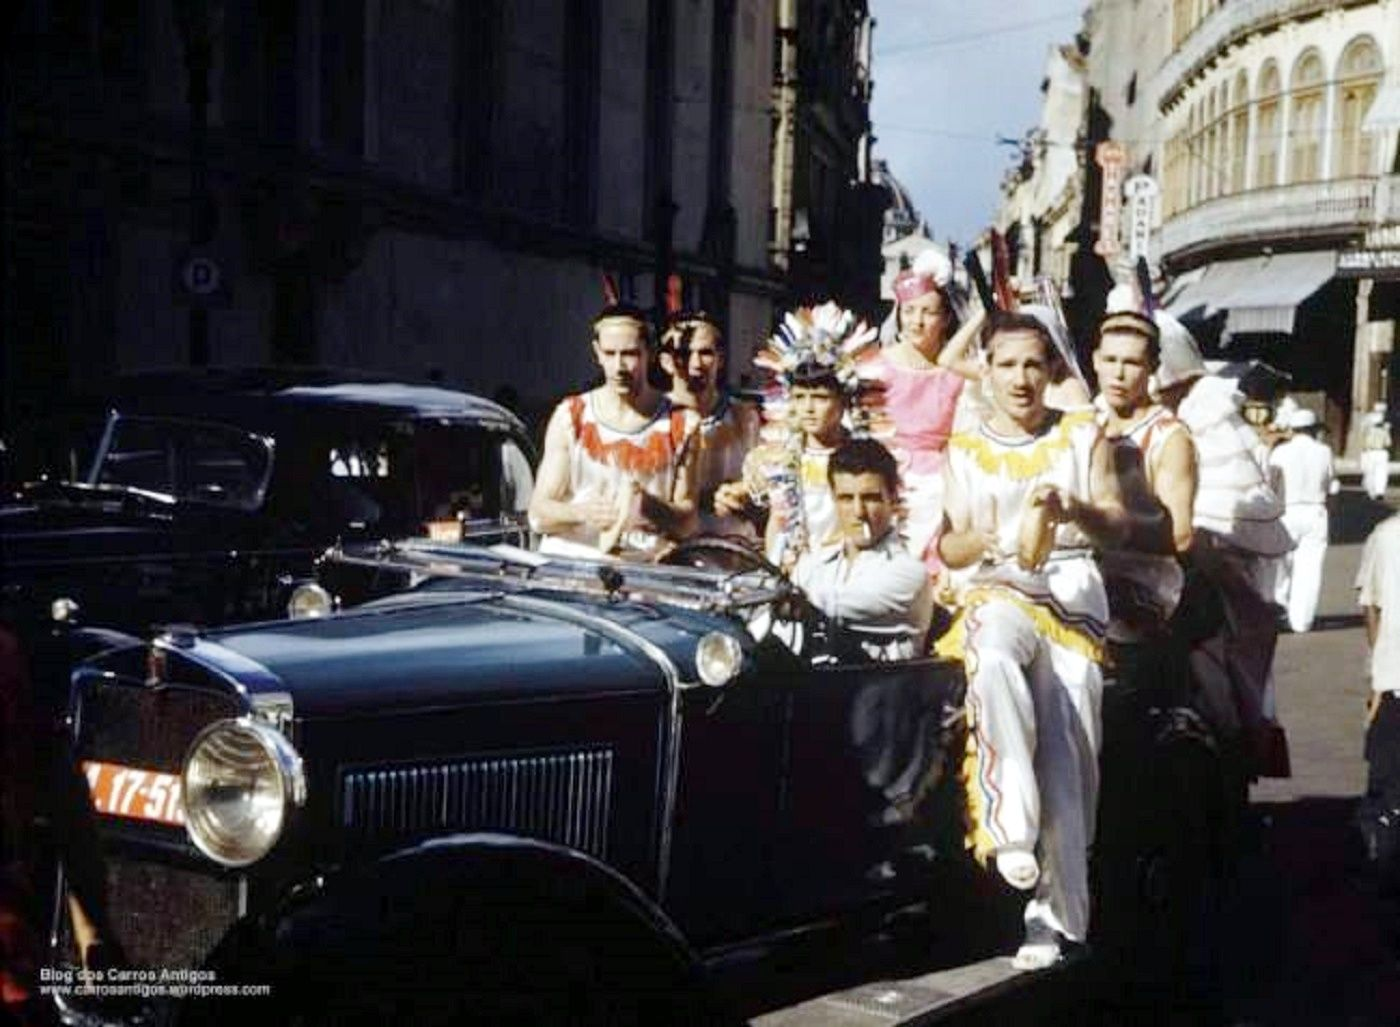 Carnaval na Glória na década de 30.  https://www.facebook.com/zonasulmemorias/photos/a.302815653159074.67909.296963573744282/752571228183512/?type=1&theater